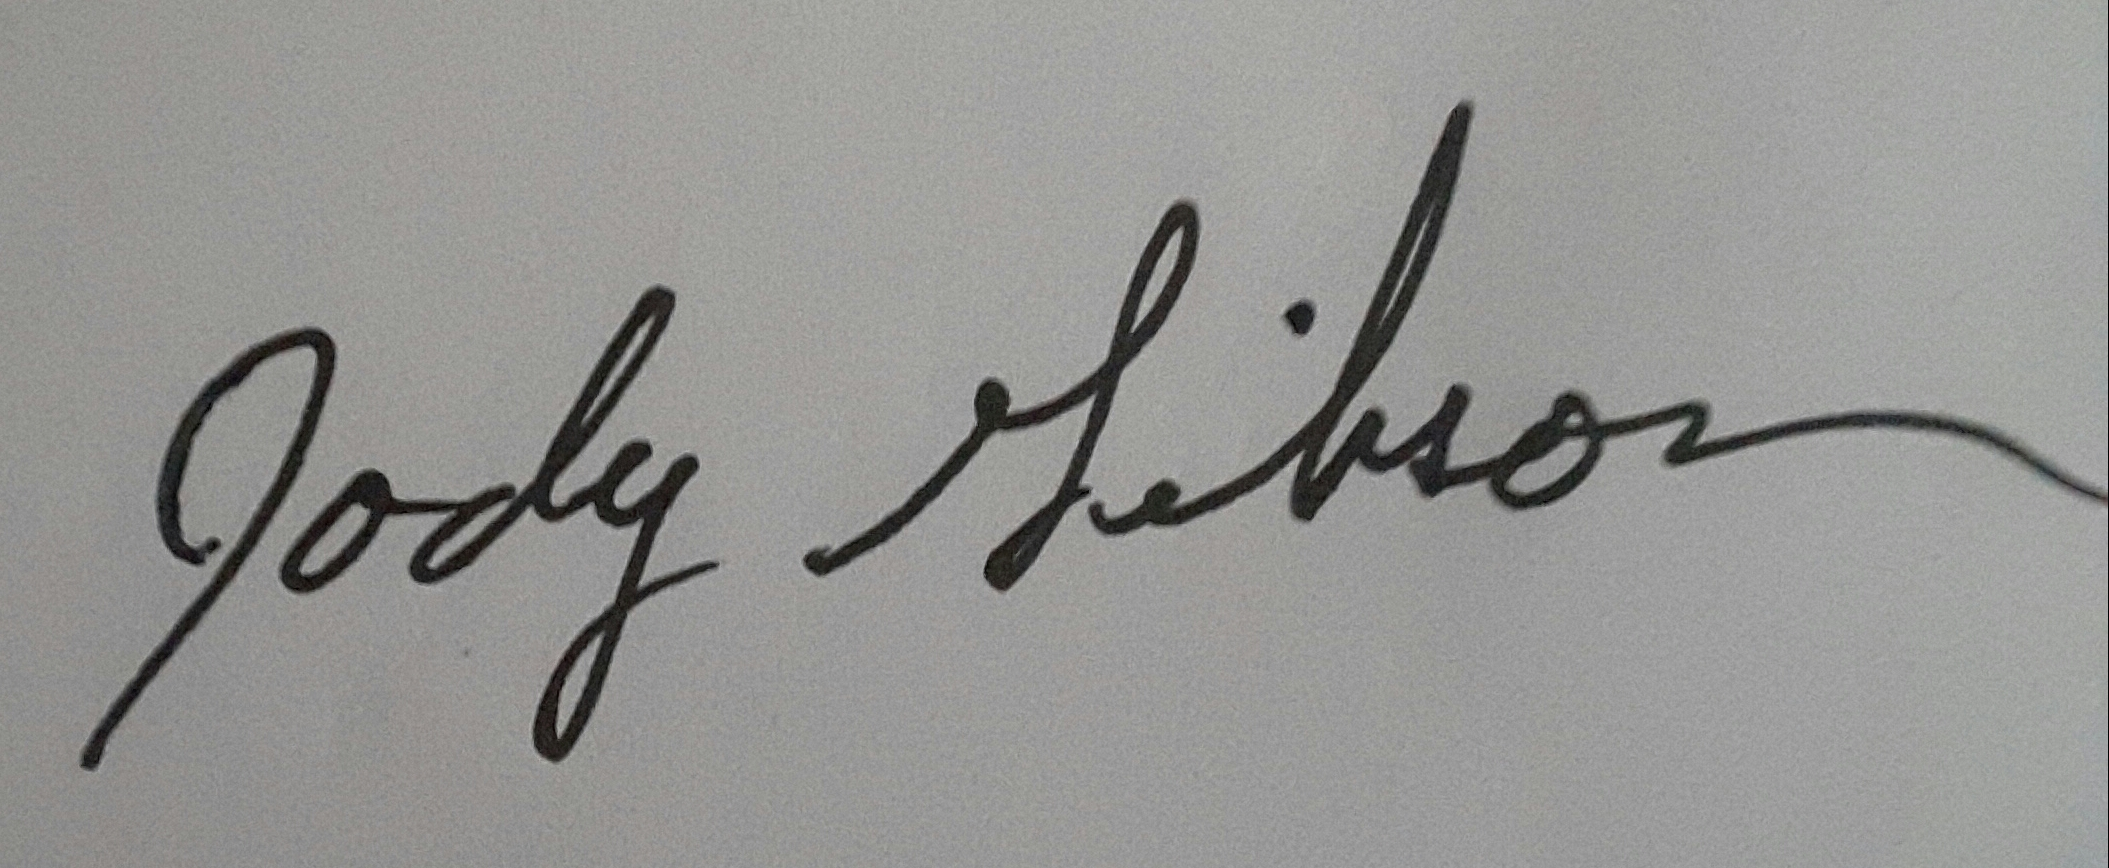 Jody Gibson's Signature